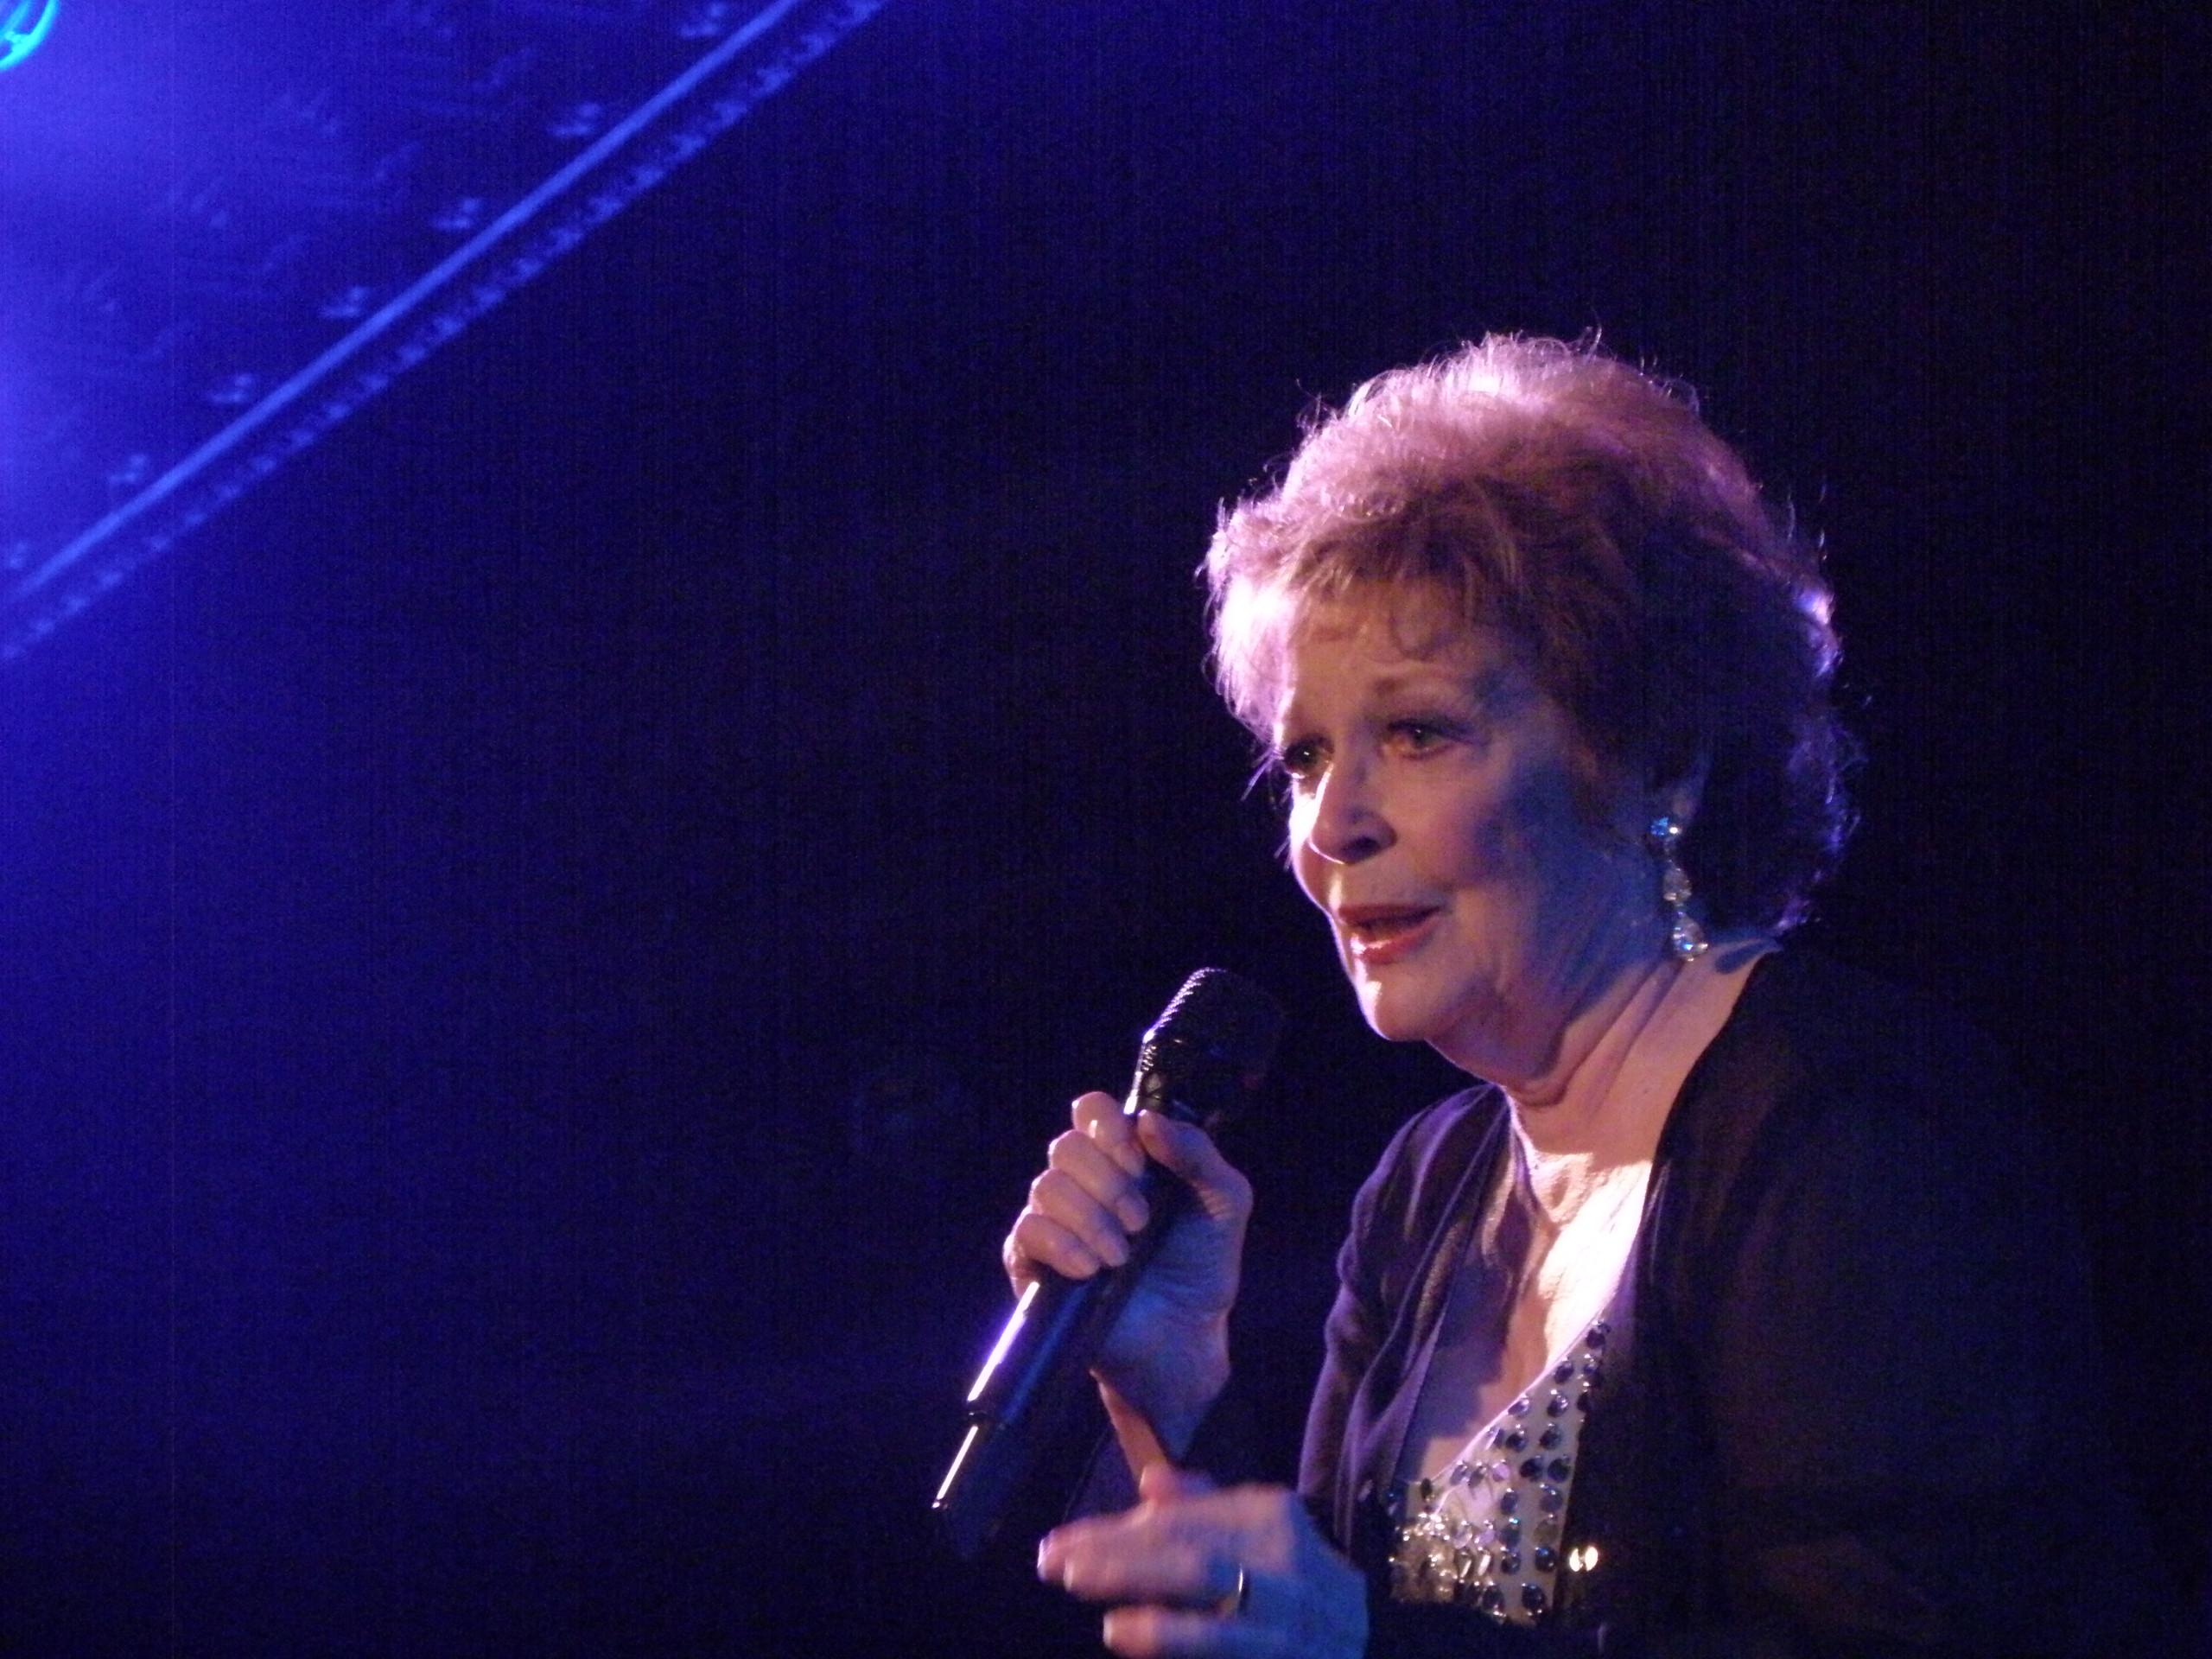 Eesha Rebba,Sonia Bergamasco Sex archive Joyce Van Patten,Debi Derryberry